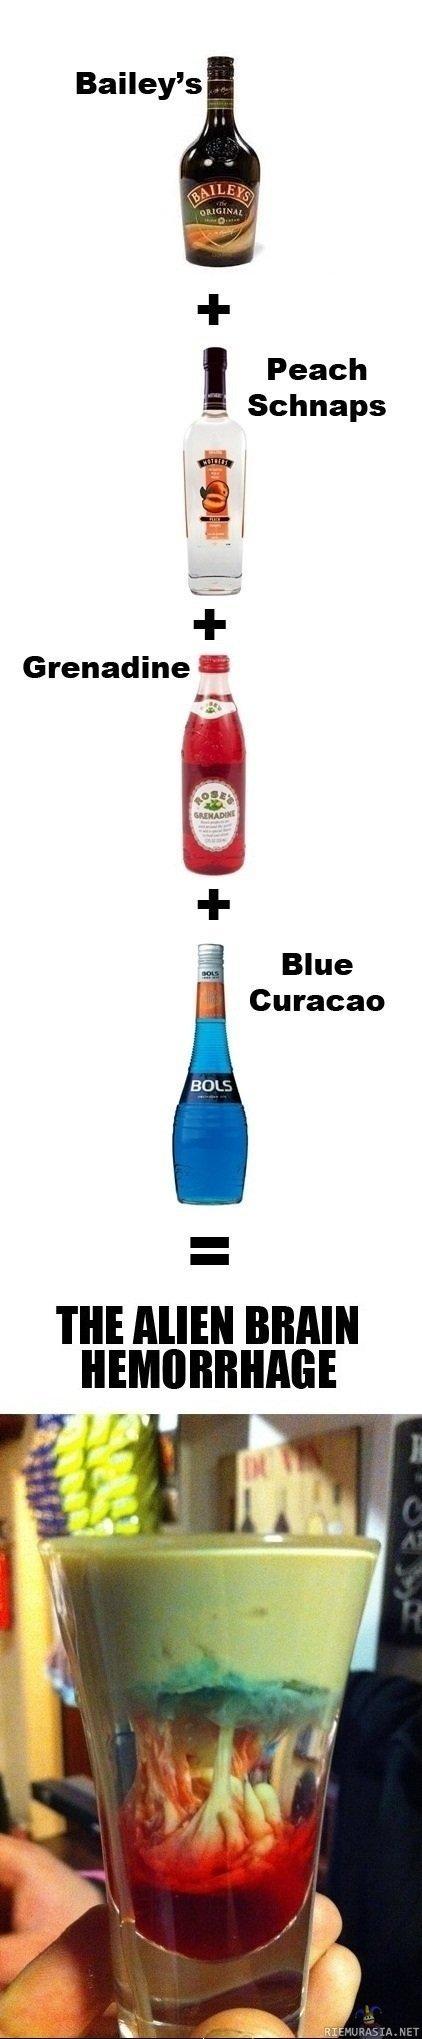 "Mixing drinks. . Bailey' s ' Peach Schnaps Grenadine "" Blue Curacao m MIR! BRAIN. Baileys, mmm creamy. Taste like death"